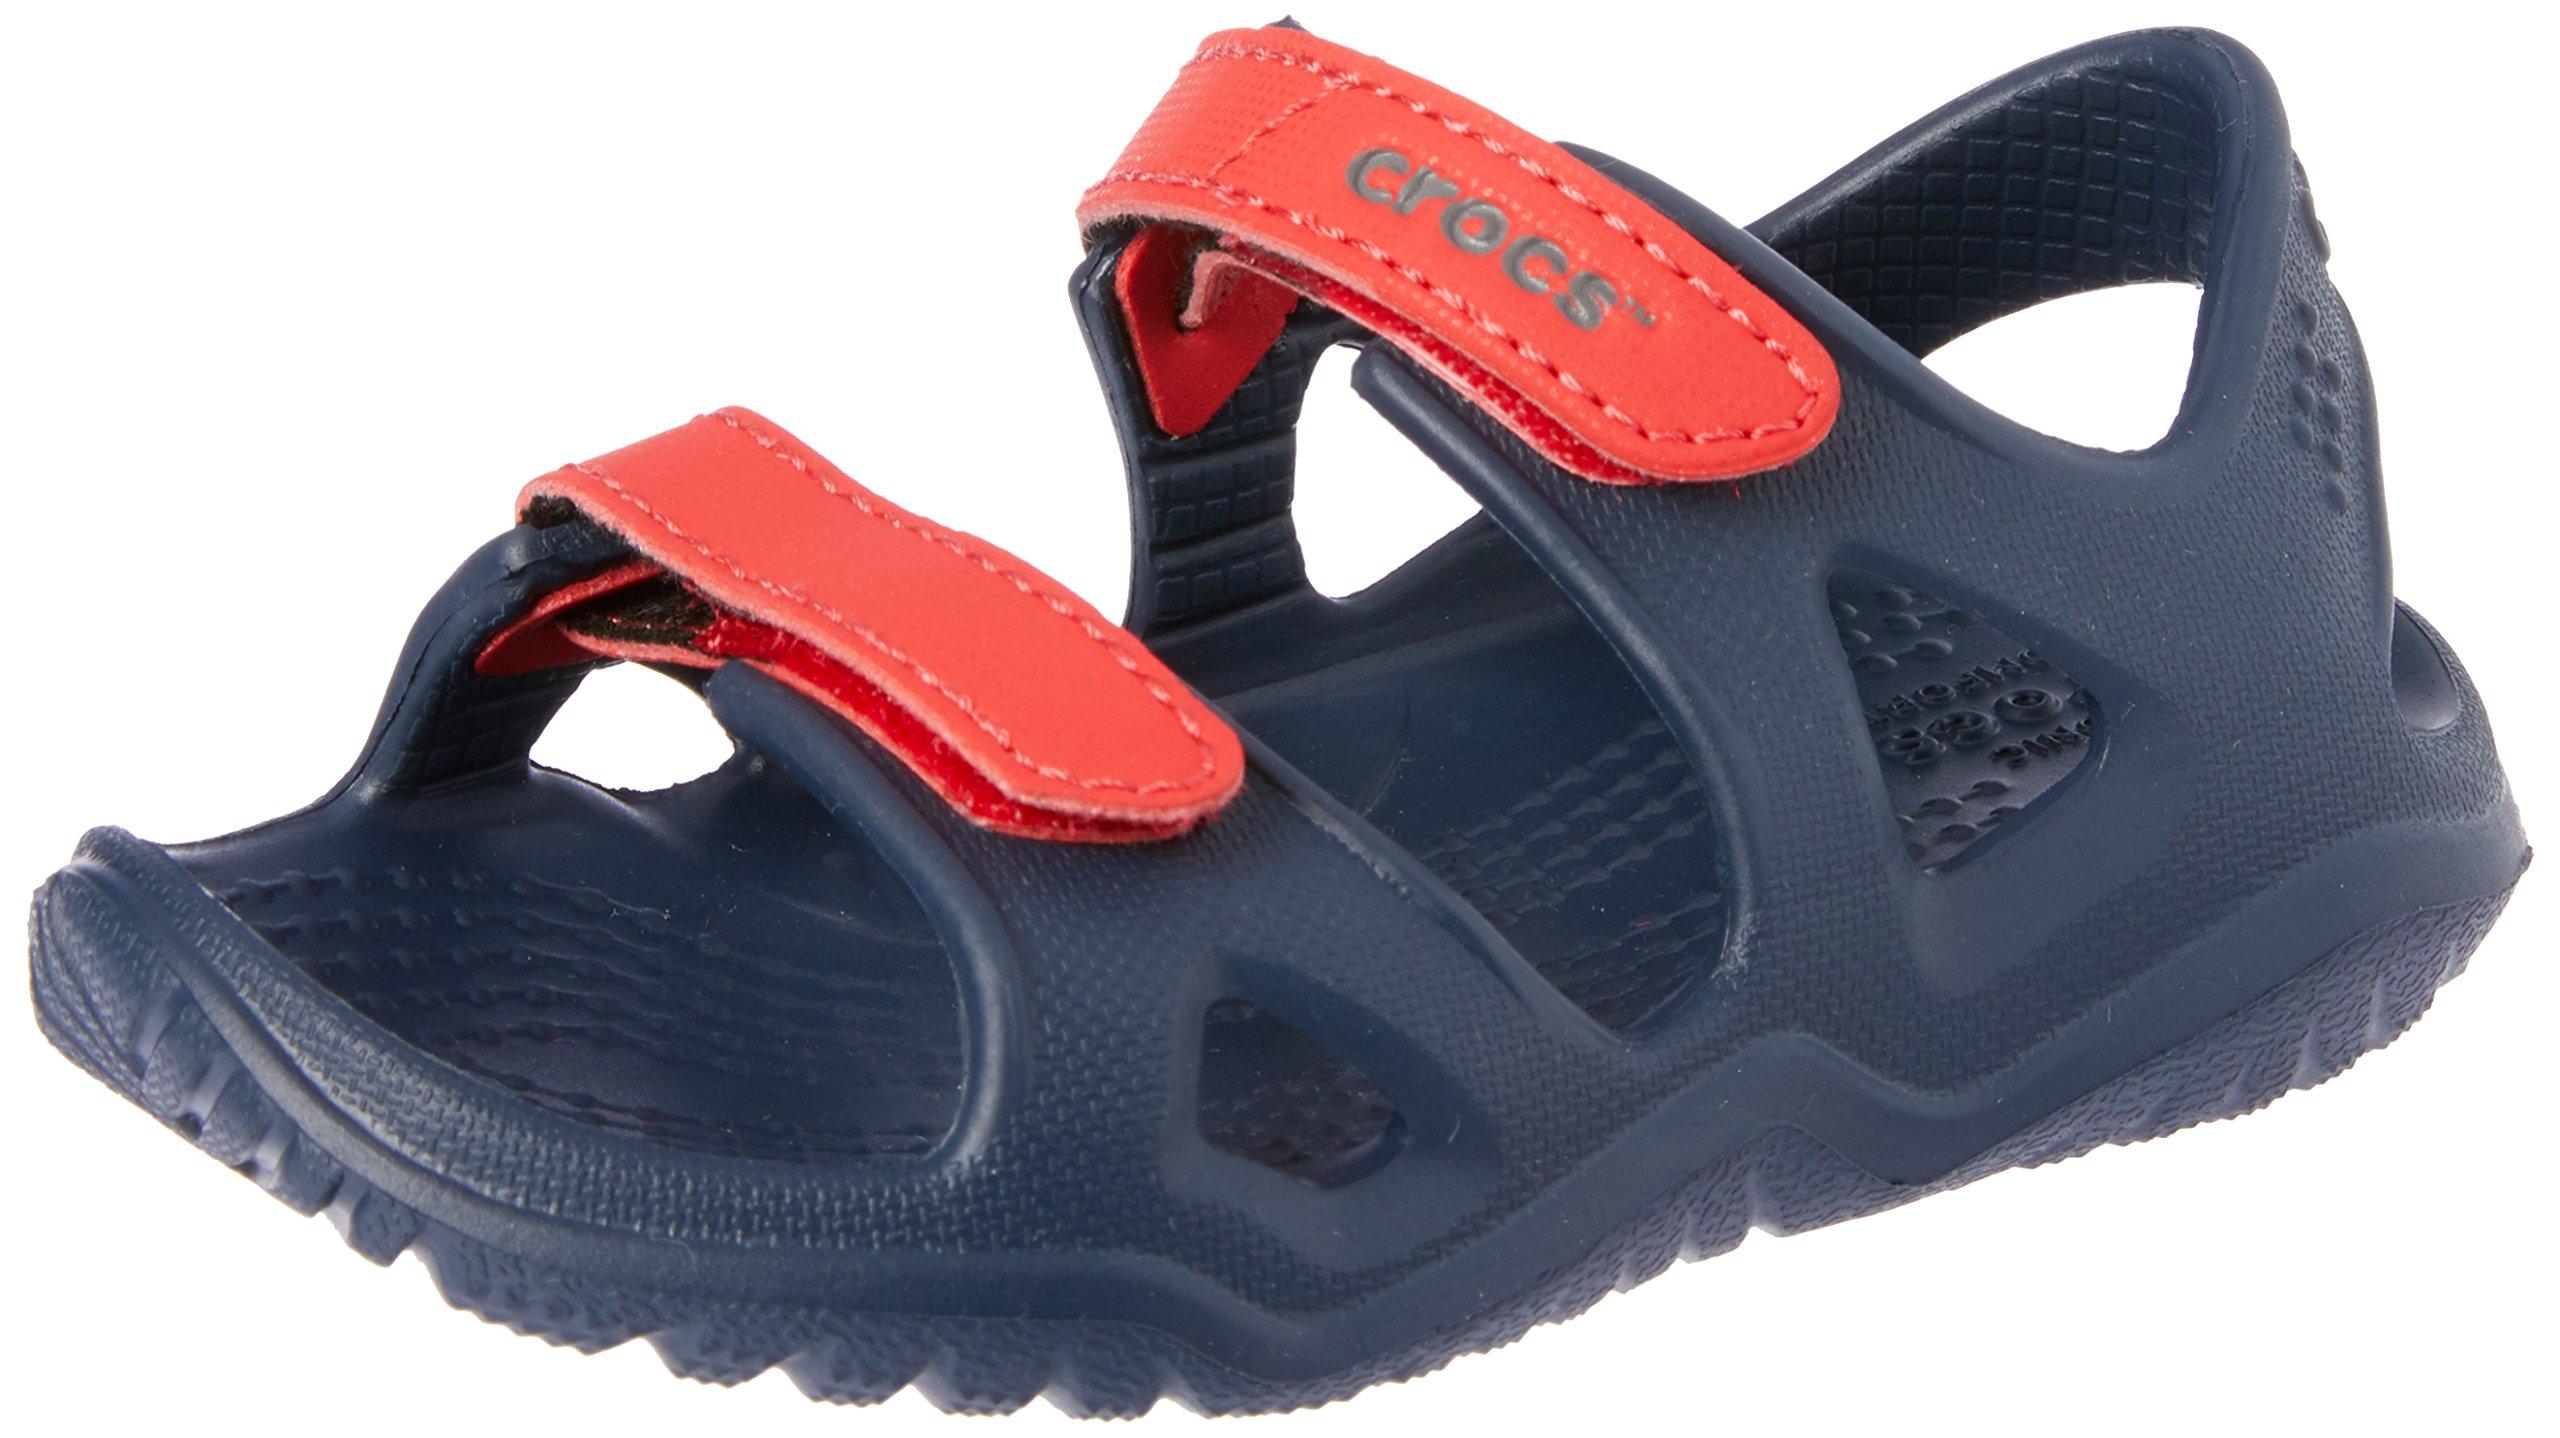 Crocs unisex-kids Swiftwater River Sandal Sandal, Navy/Flame, 8 M US Toddler by Crocs